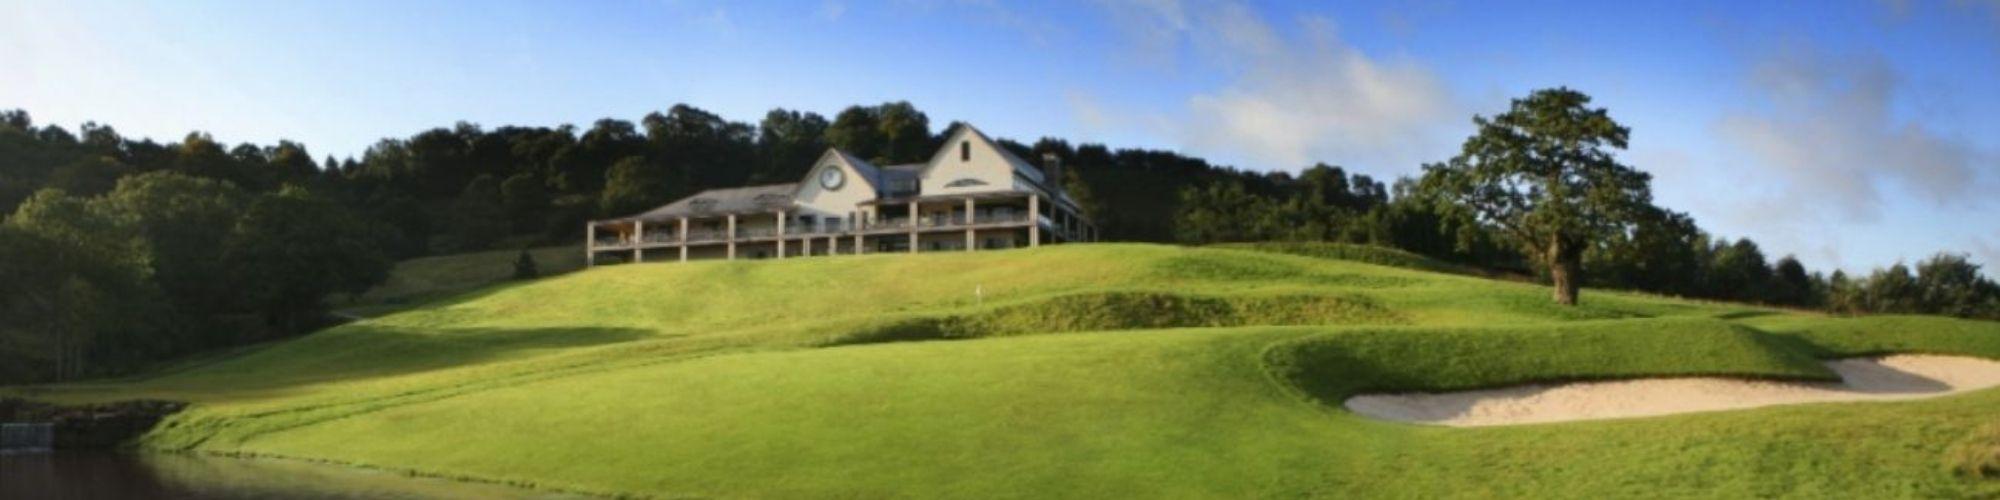 Top 5 reasons to visit Celtic Manor Resort